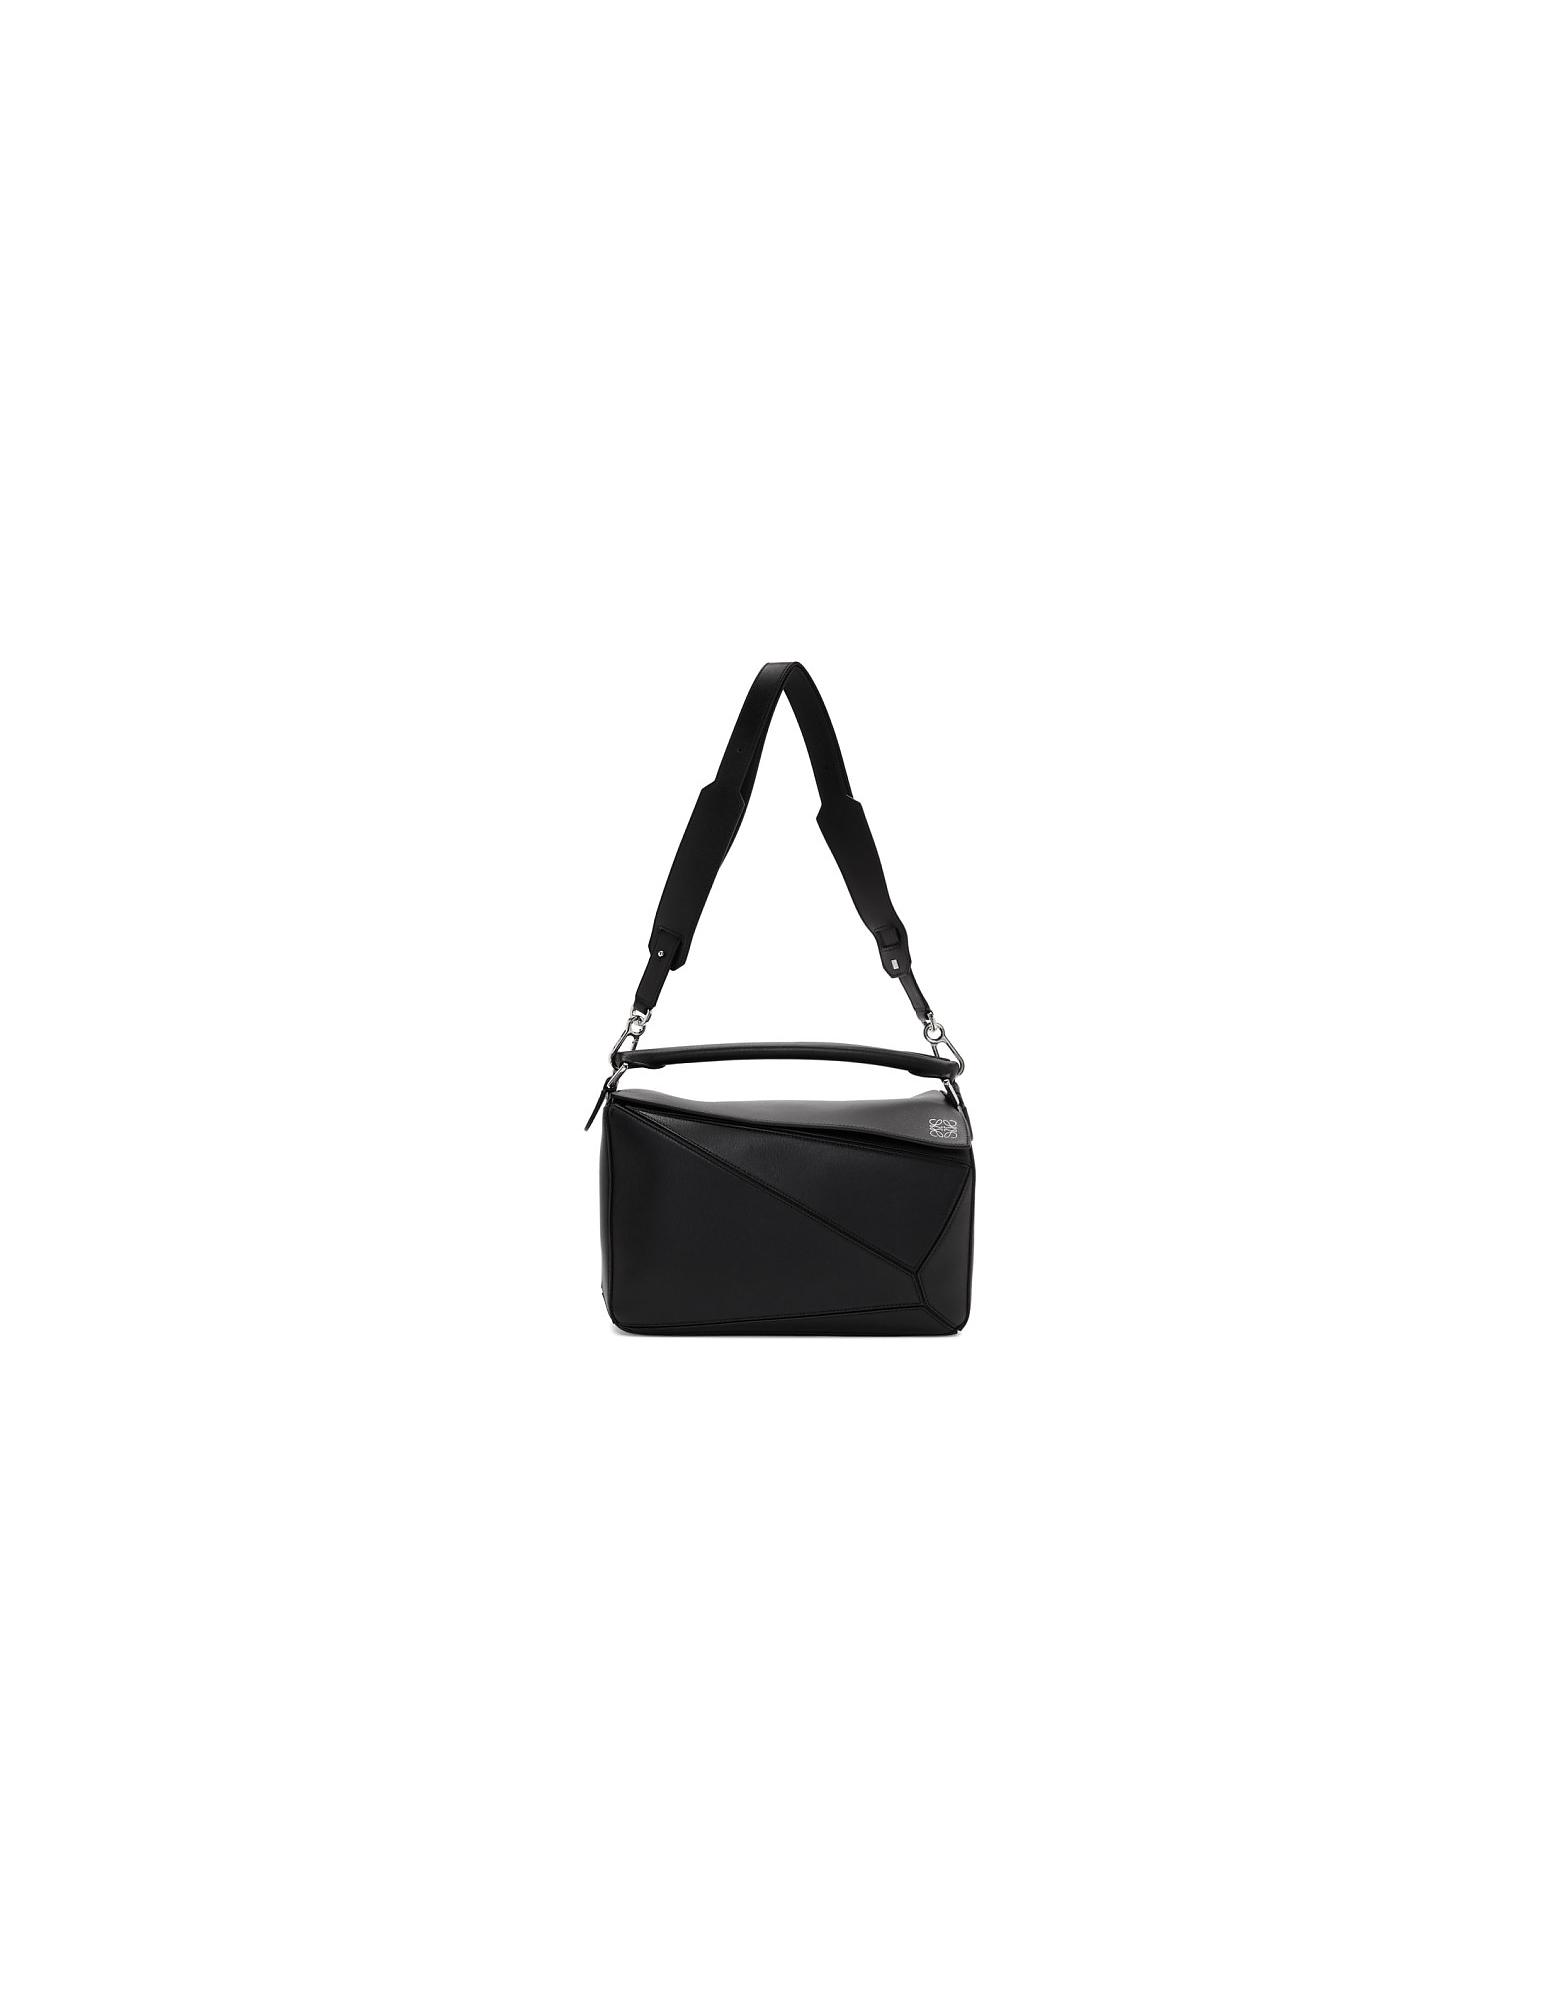 Loewe Designer Handbags, Black Puzzle Bag